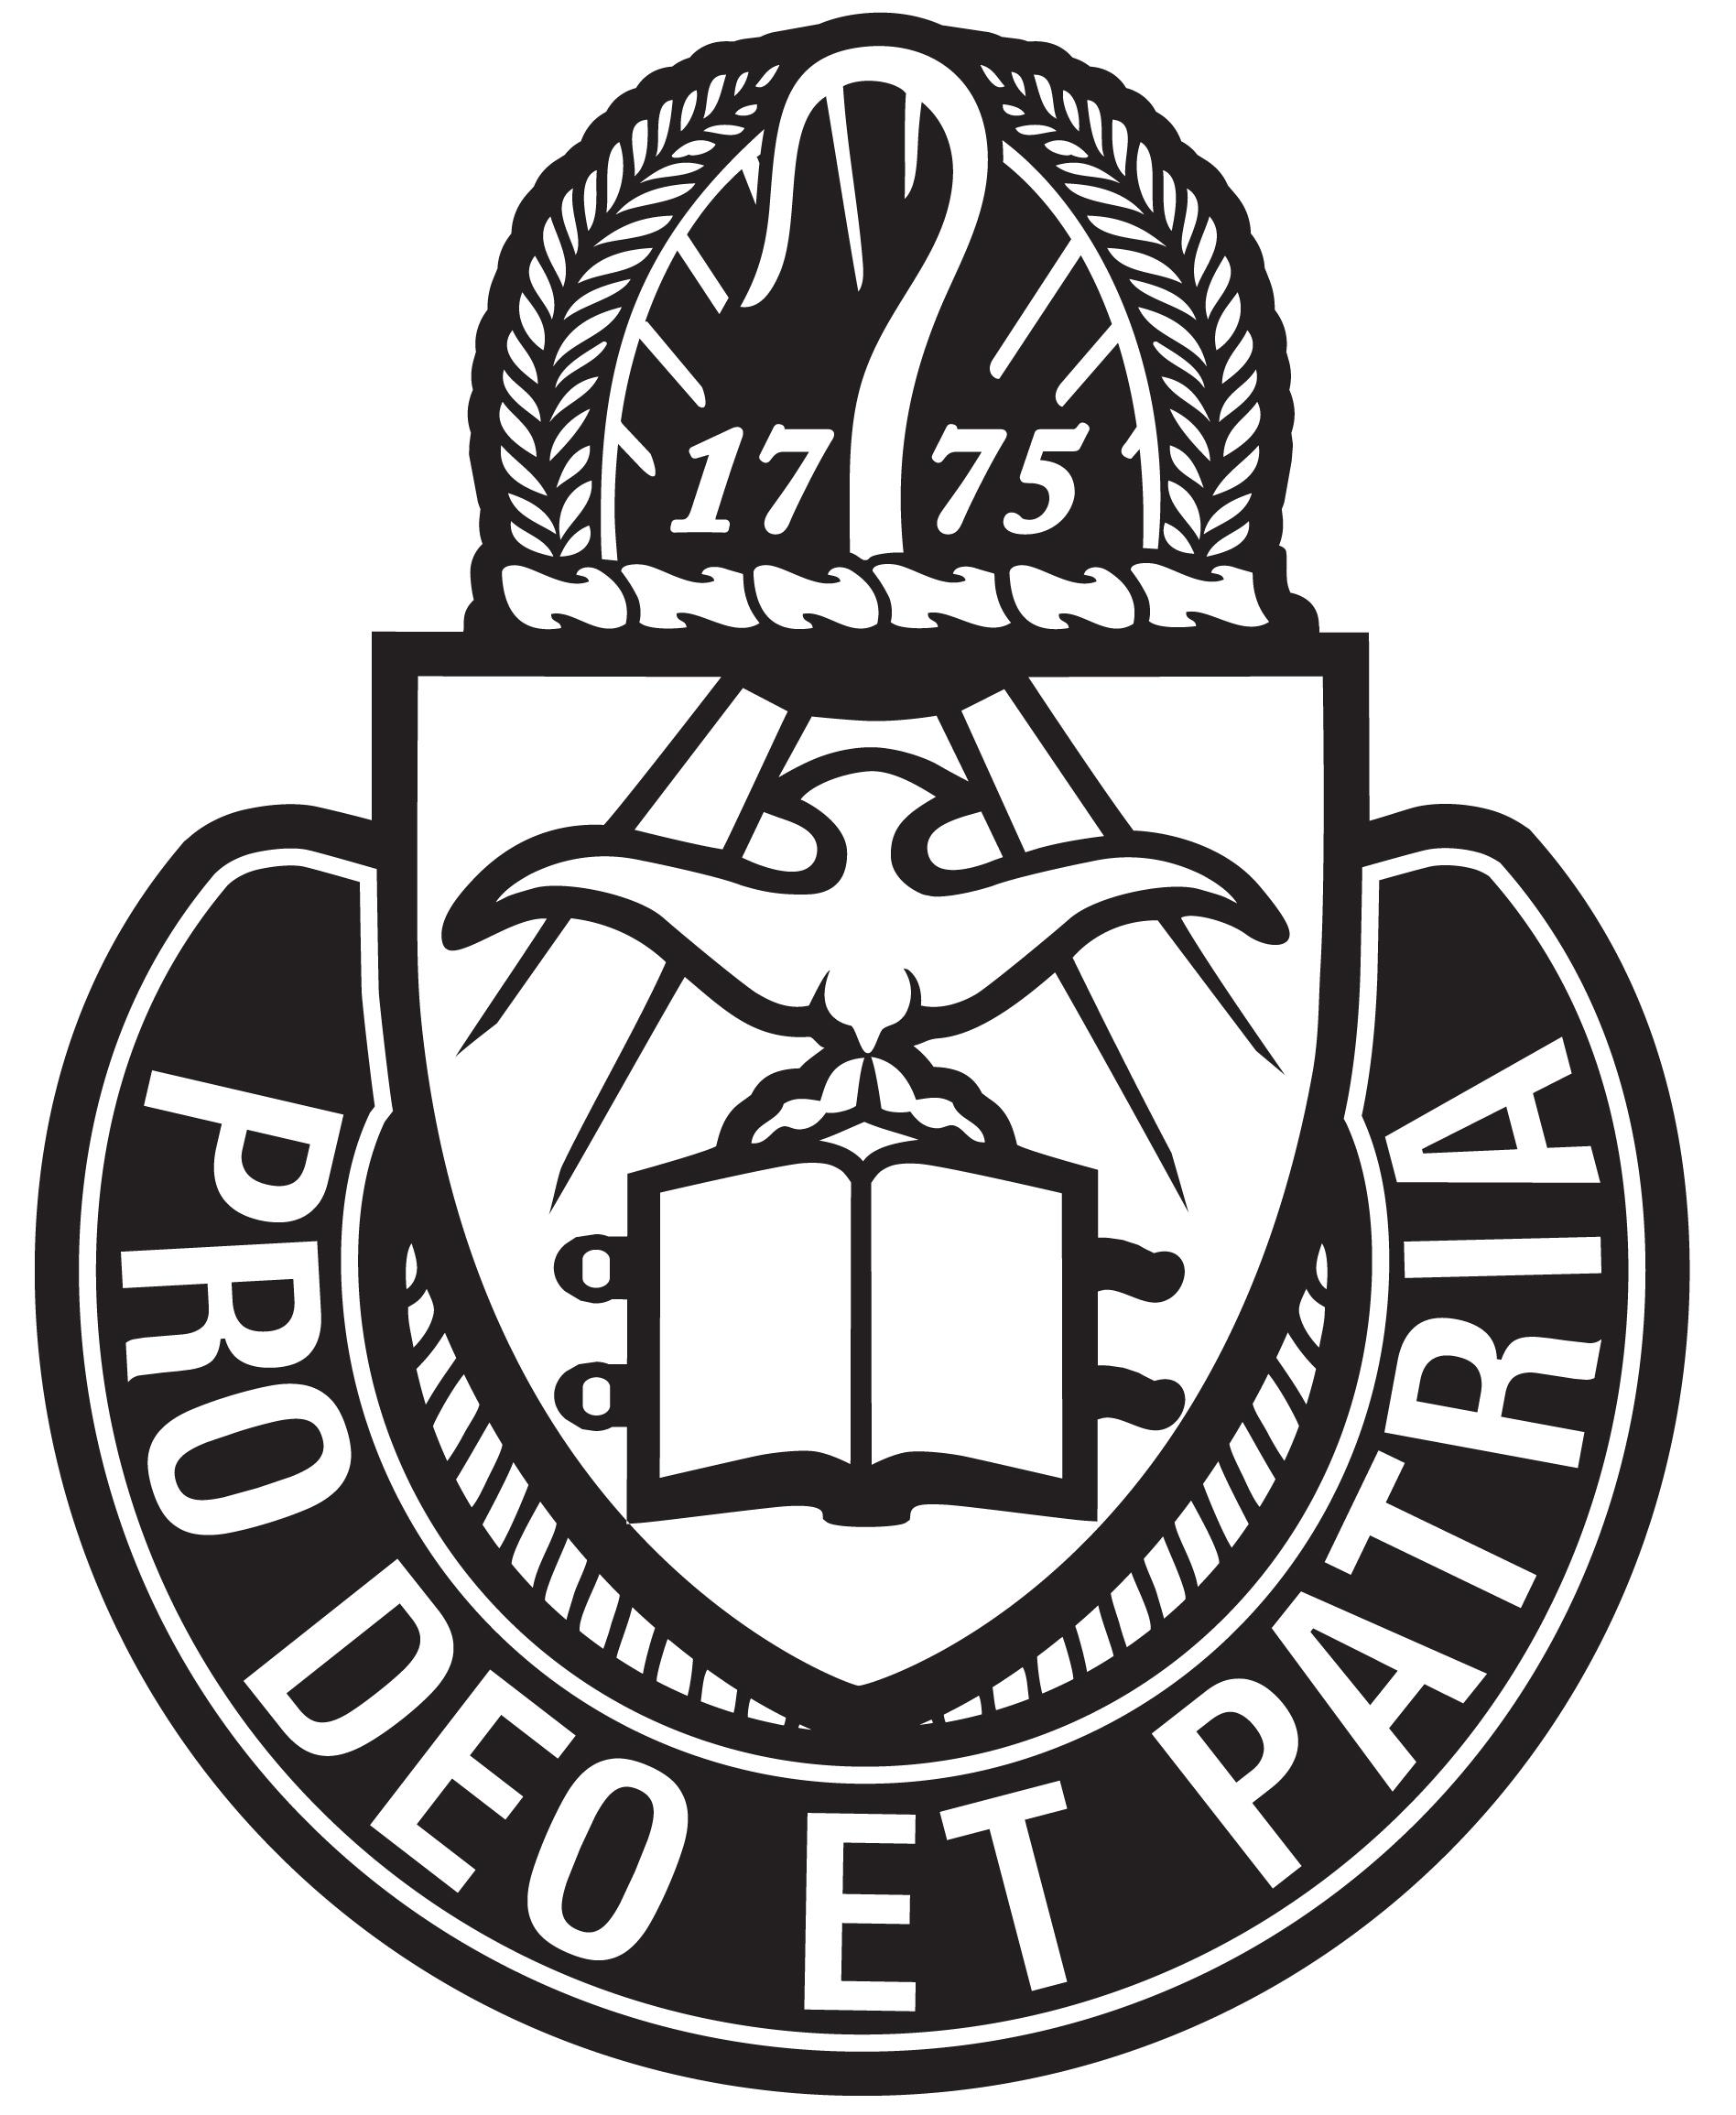 Current Chaplain Crest Black White JPG